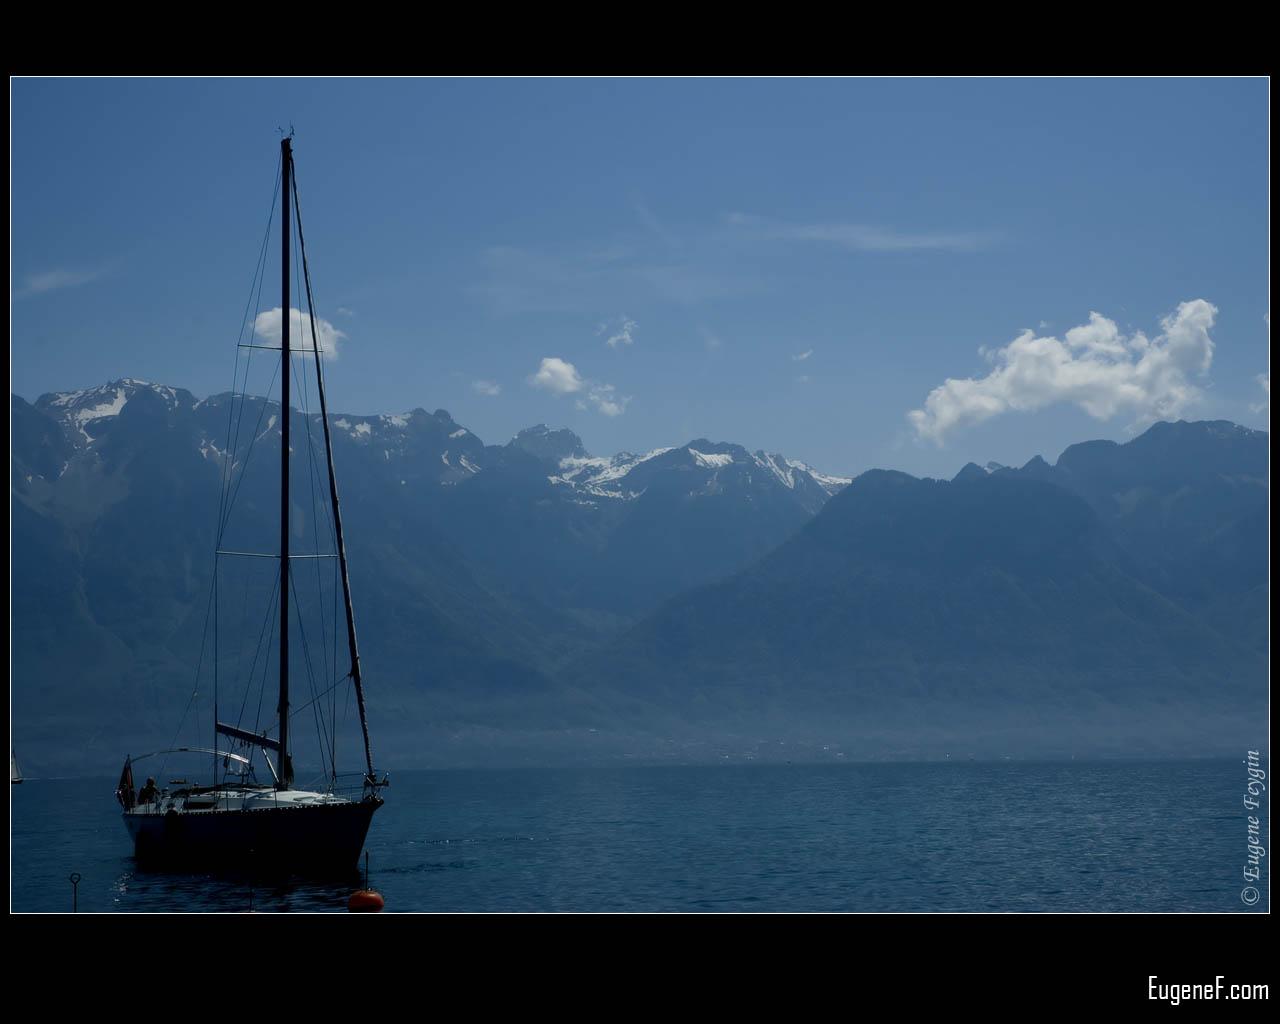 Sailing in Switzerland